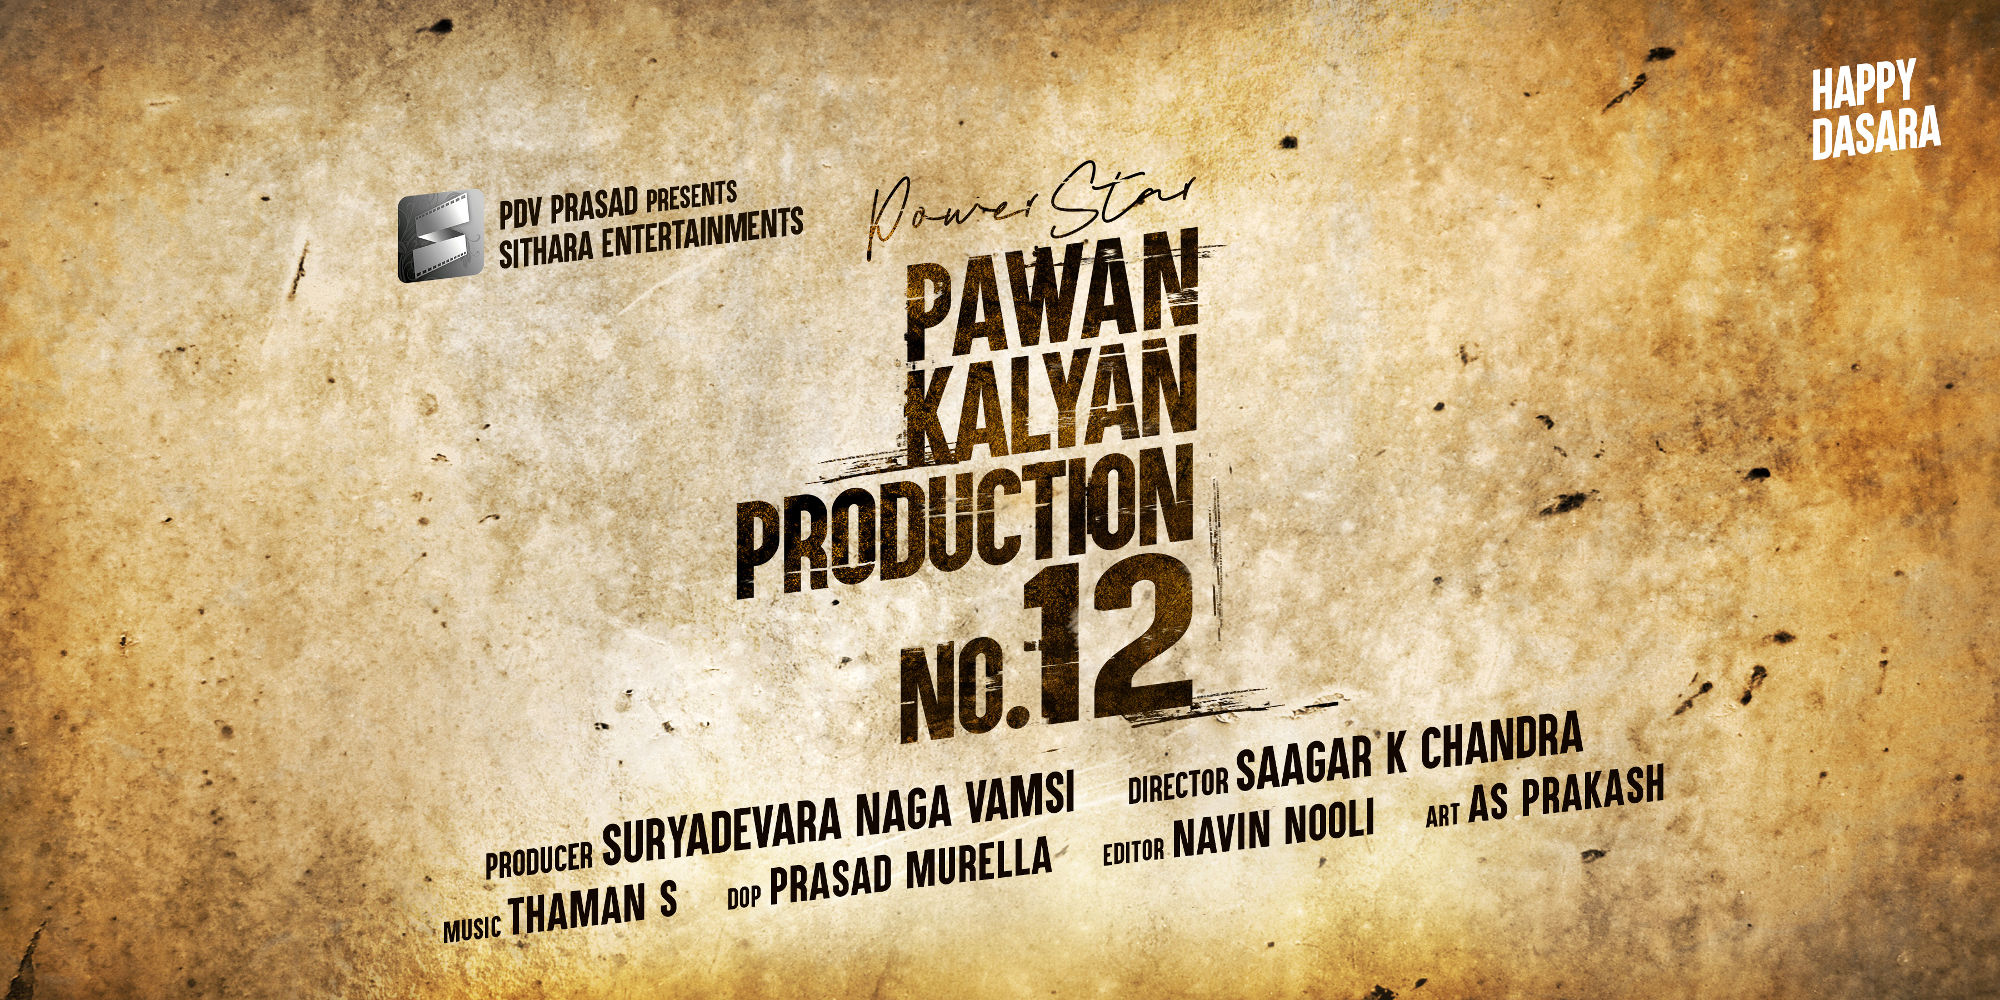 Powerstar Pawan Kalyan and Sithara Entertainments Production No 12 Film Announcement